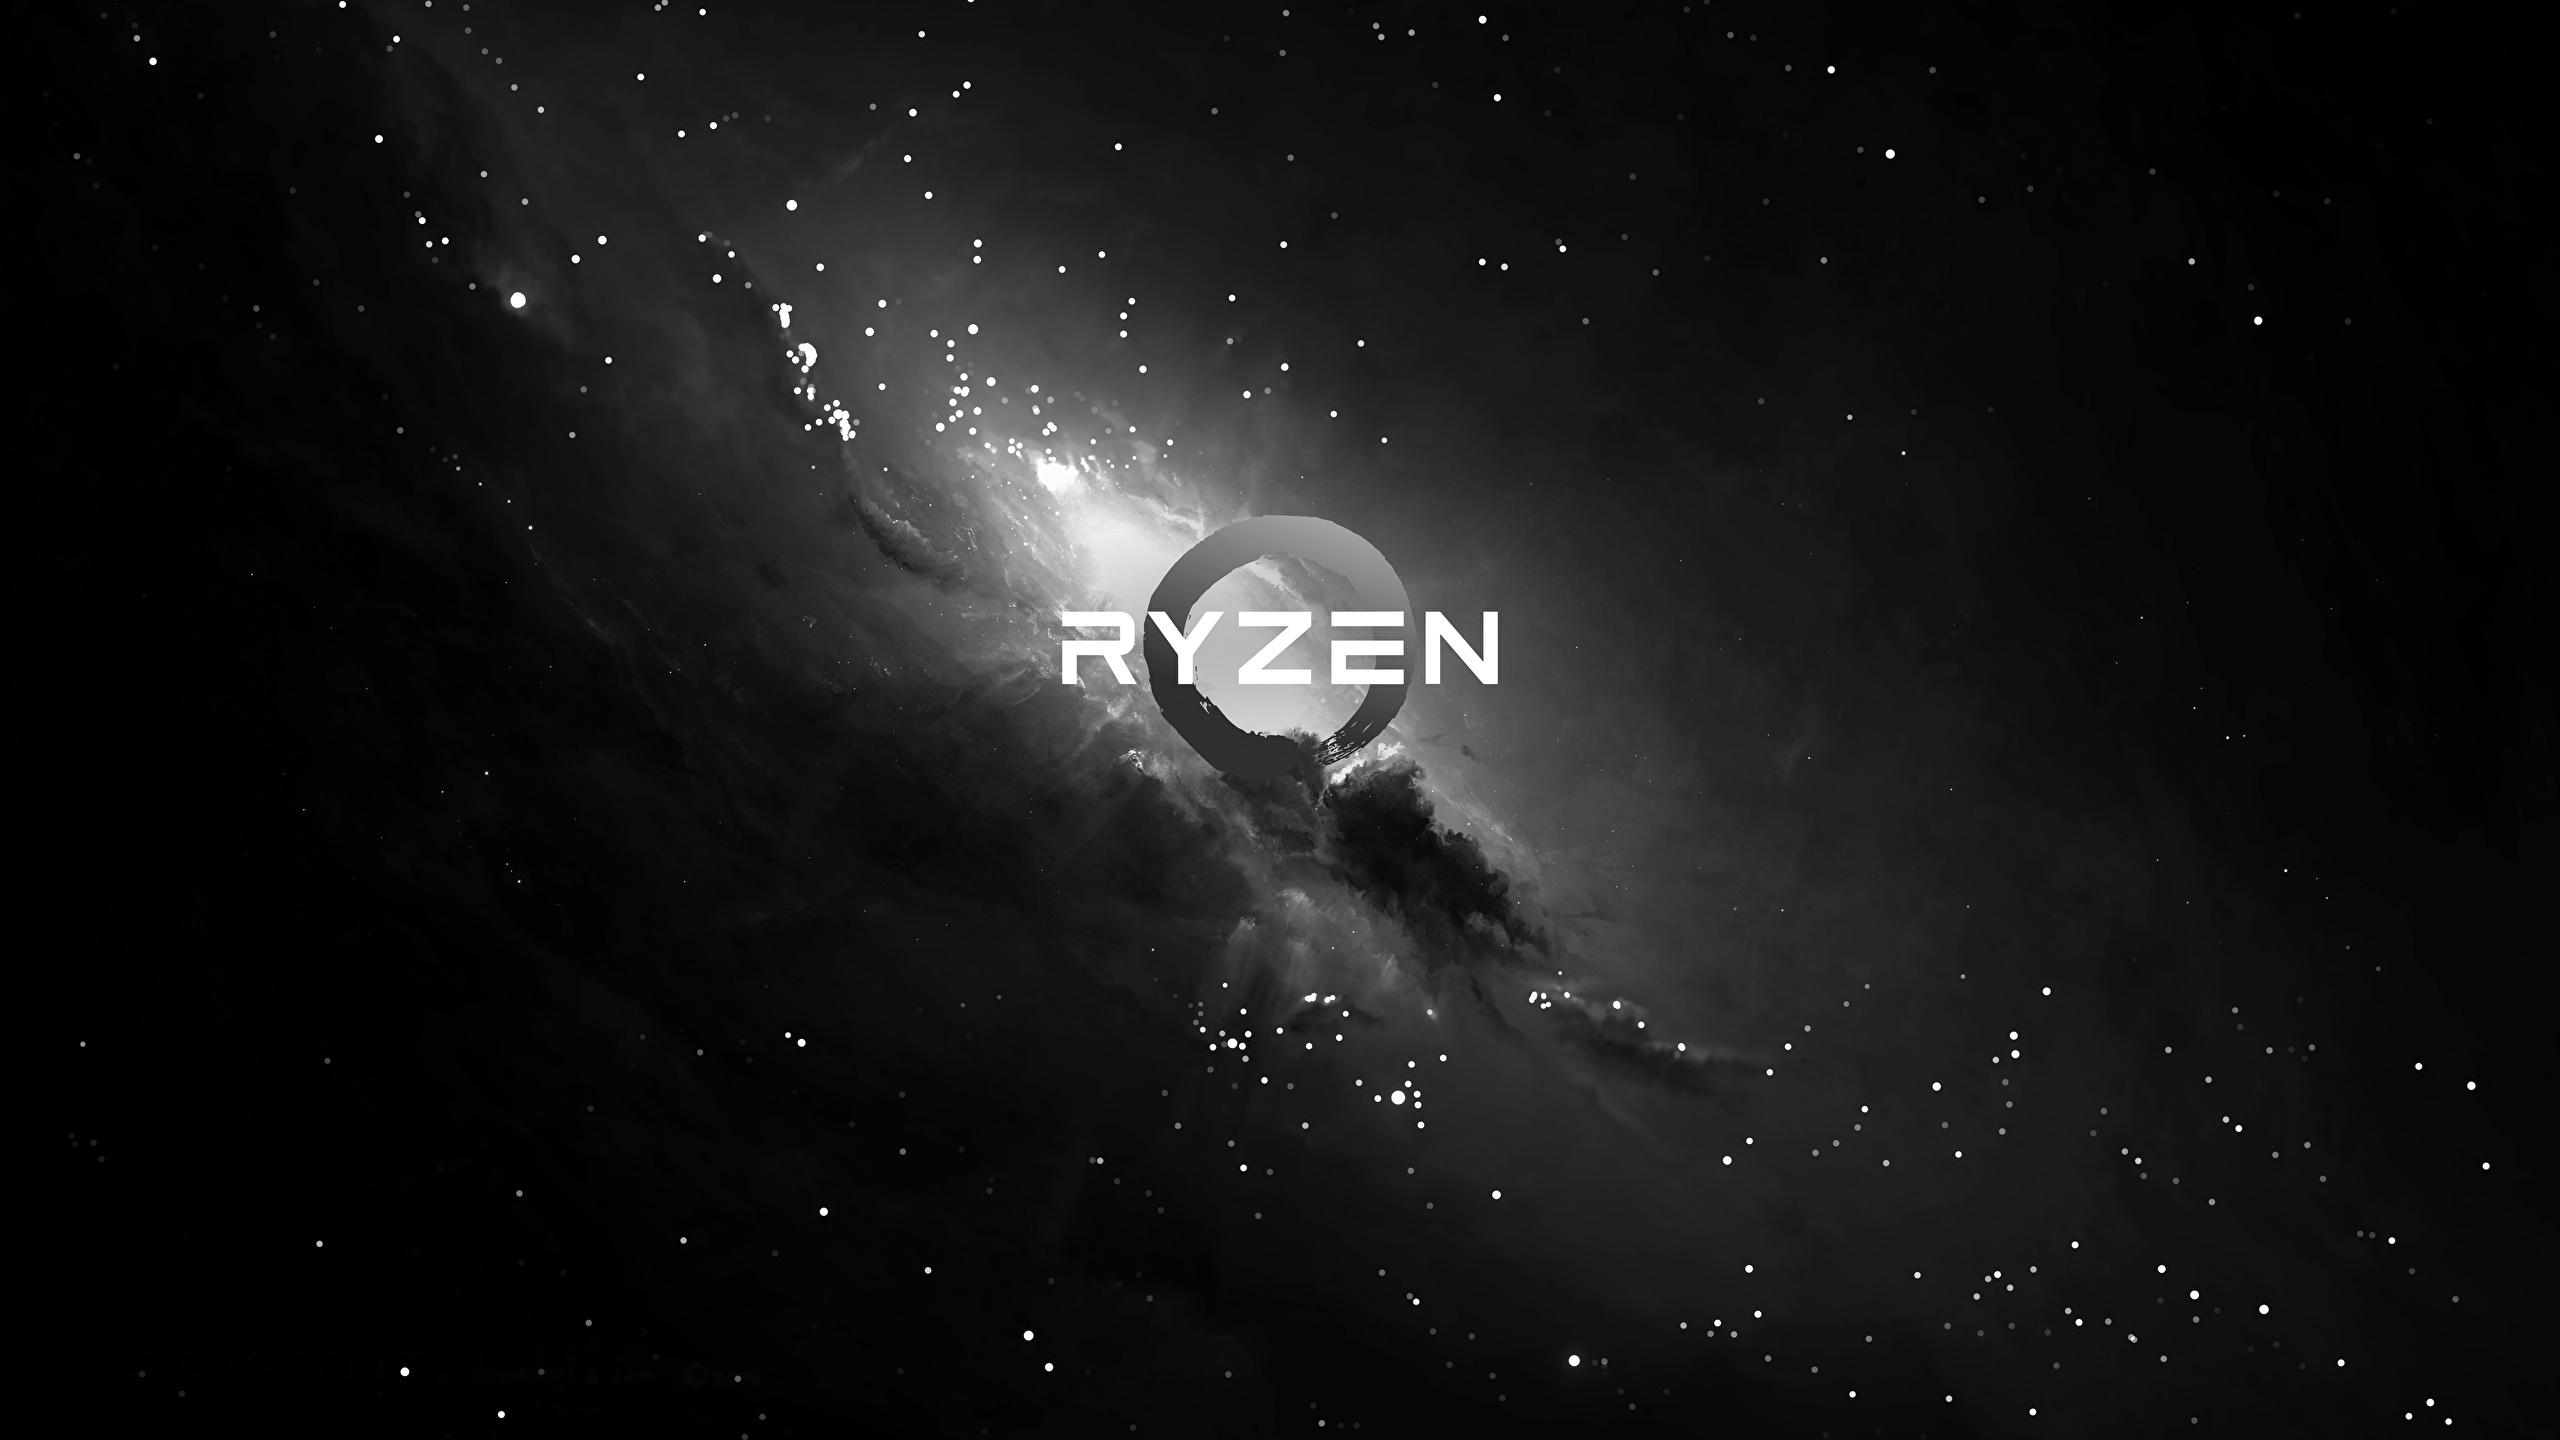 Å£ç´™ 2560x1440 Amd íゴエンブレム Ryzen Ǚ½é»' ³ンピューター Àウンロード ņ™çœŸ